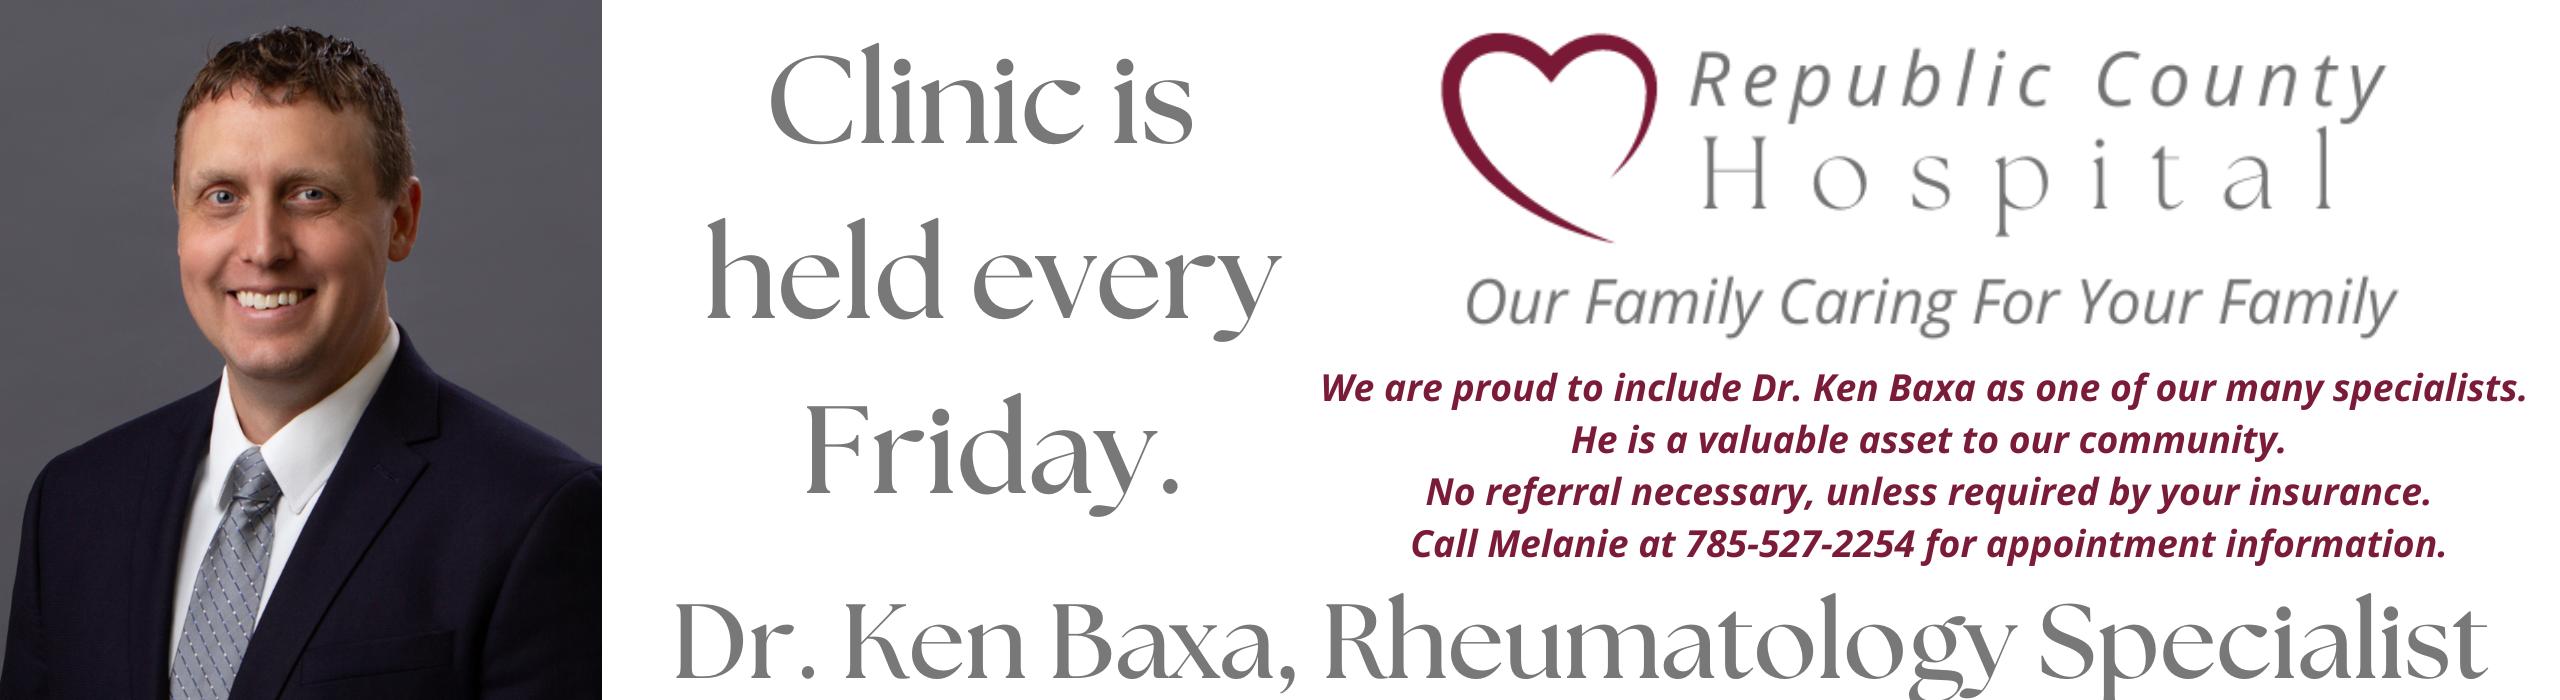 Now Holding Clinic every Friday  Dr. Ken Bexa, Rheumatology Specialist.